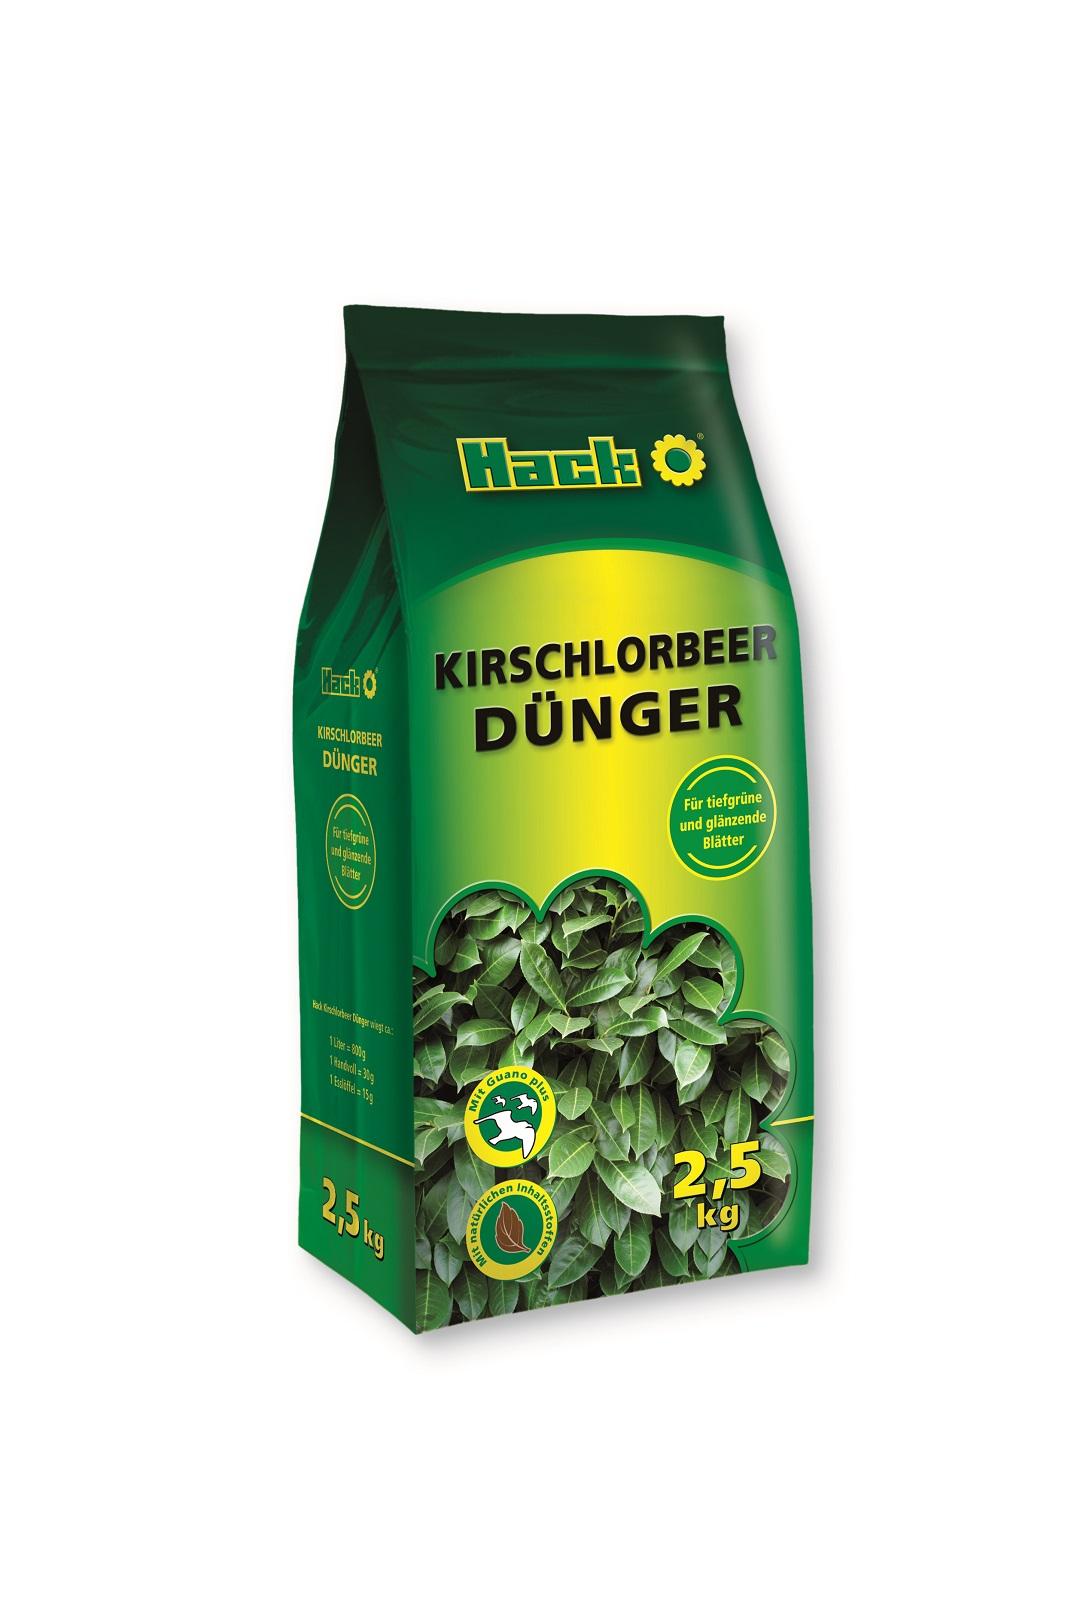 Hack Kirschlorbeerdünger Dünger 2,5 kg